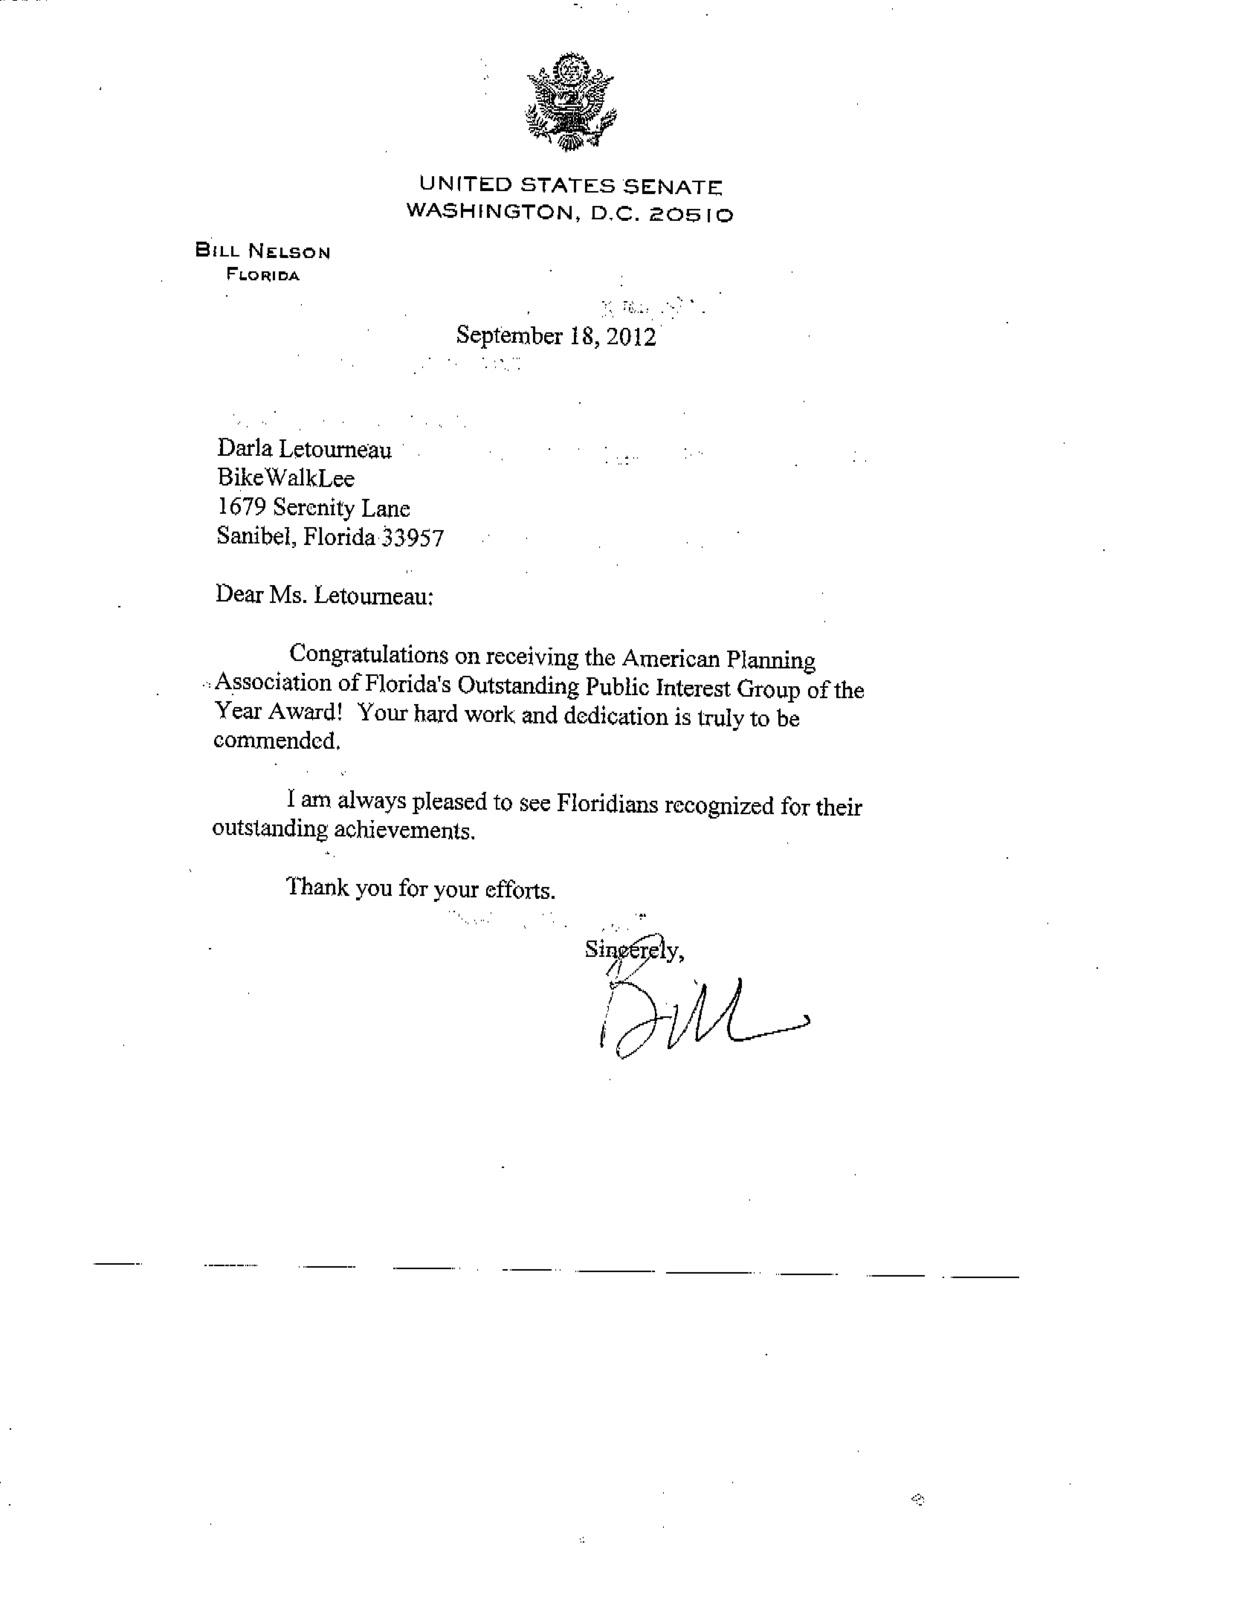 And Bikewalklee Received Congratulatory Letter From Senator Bill Nelson